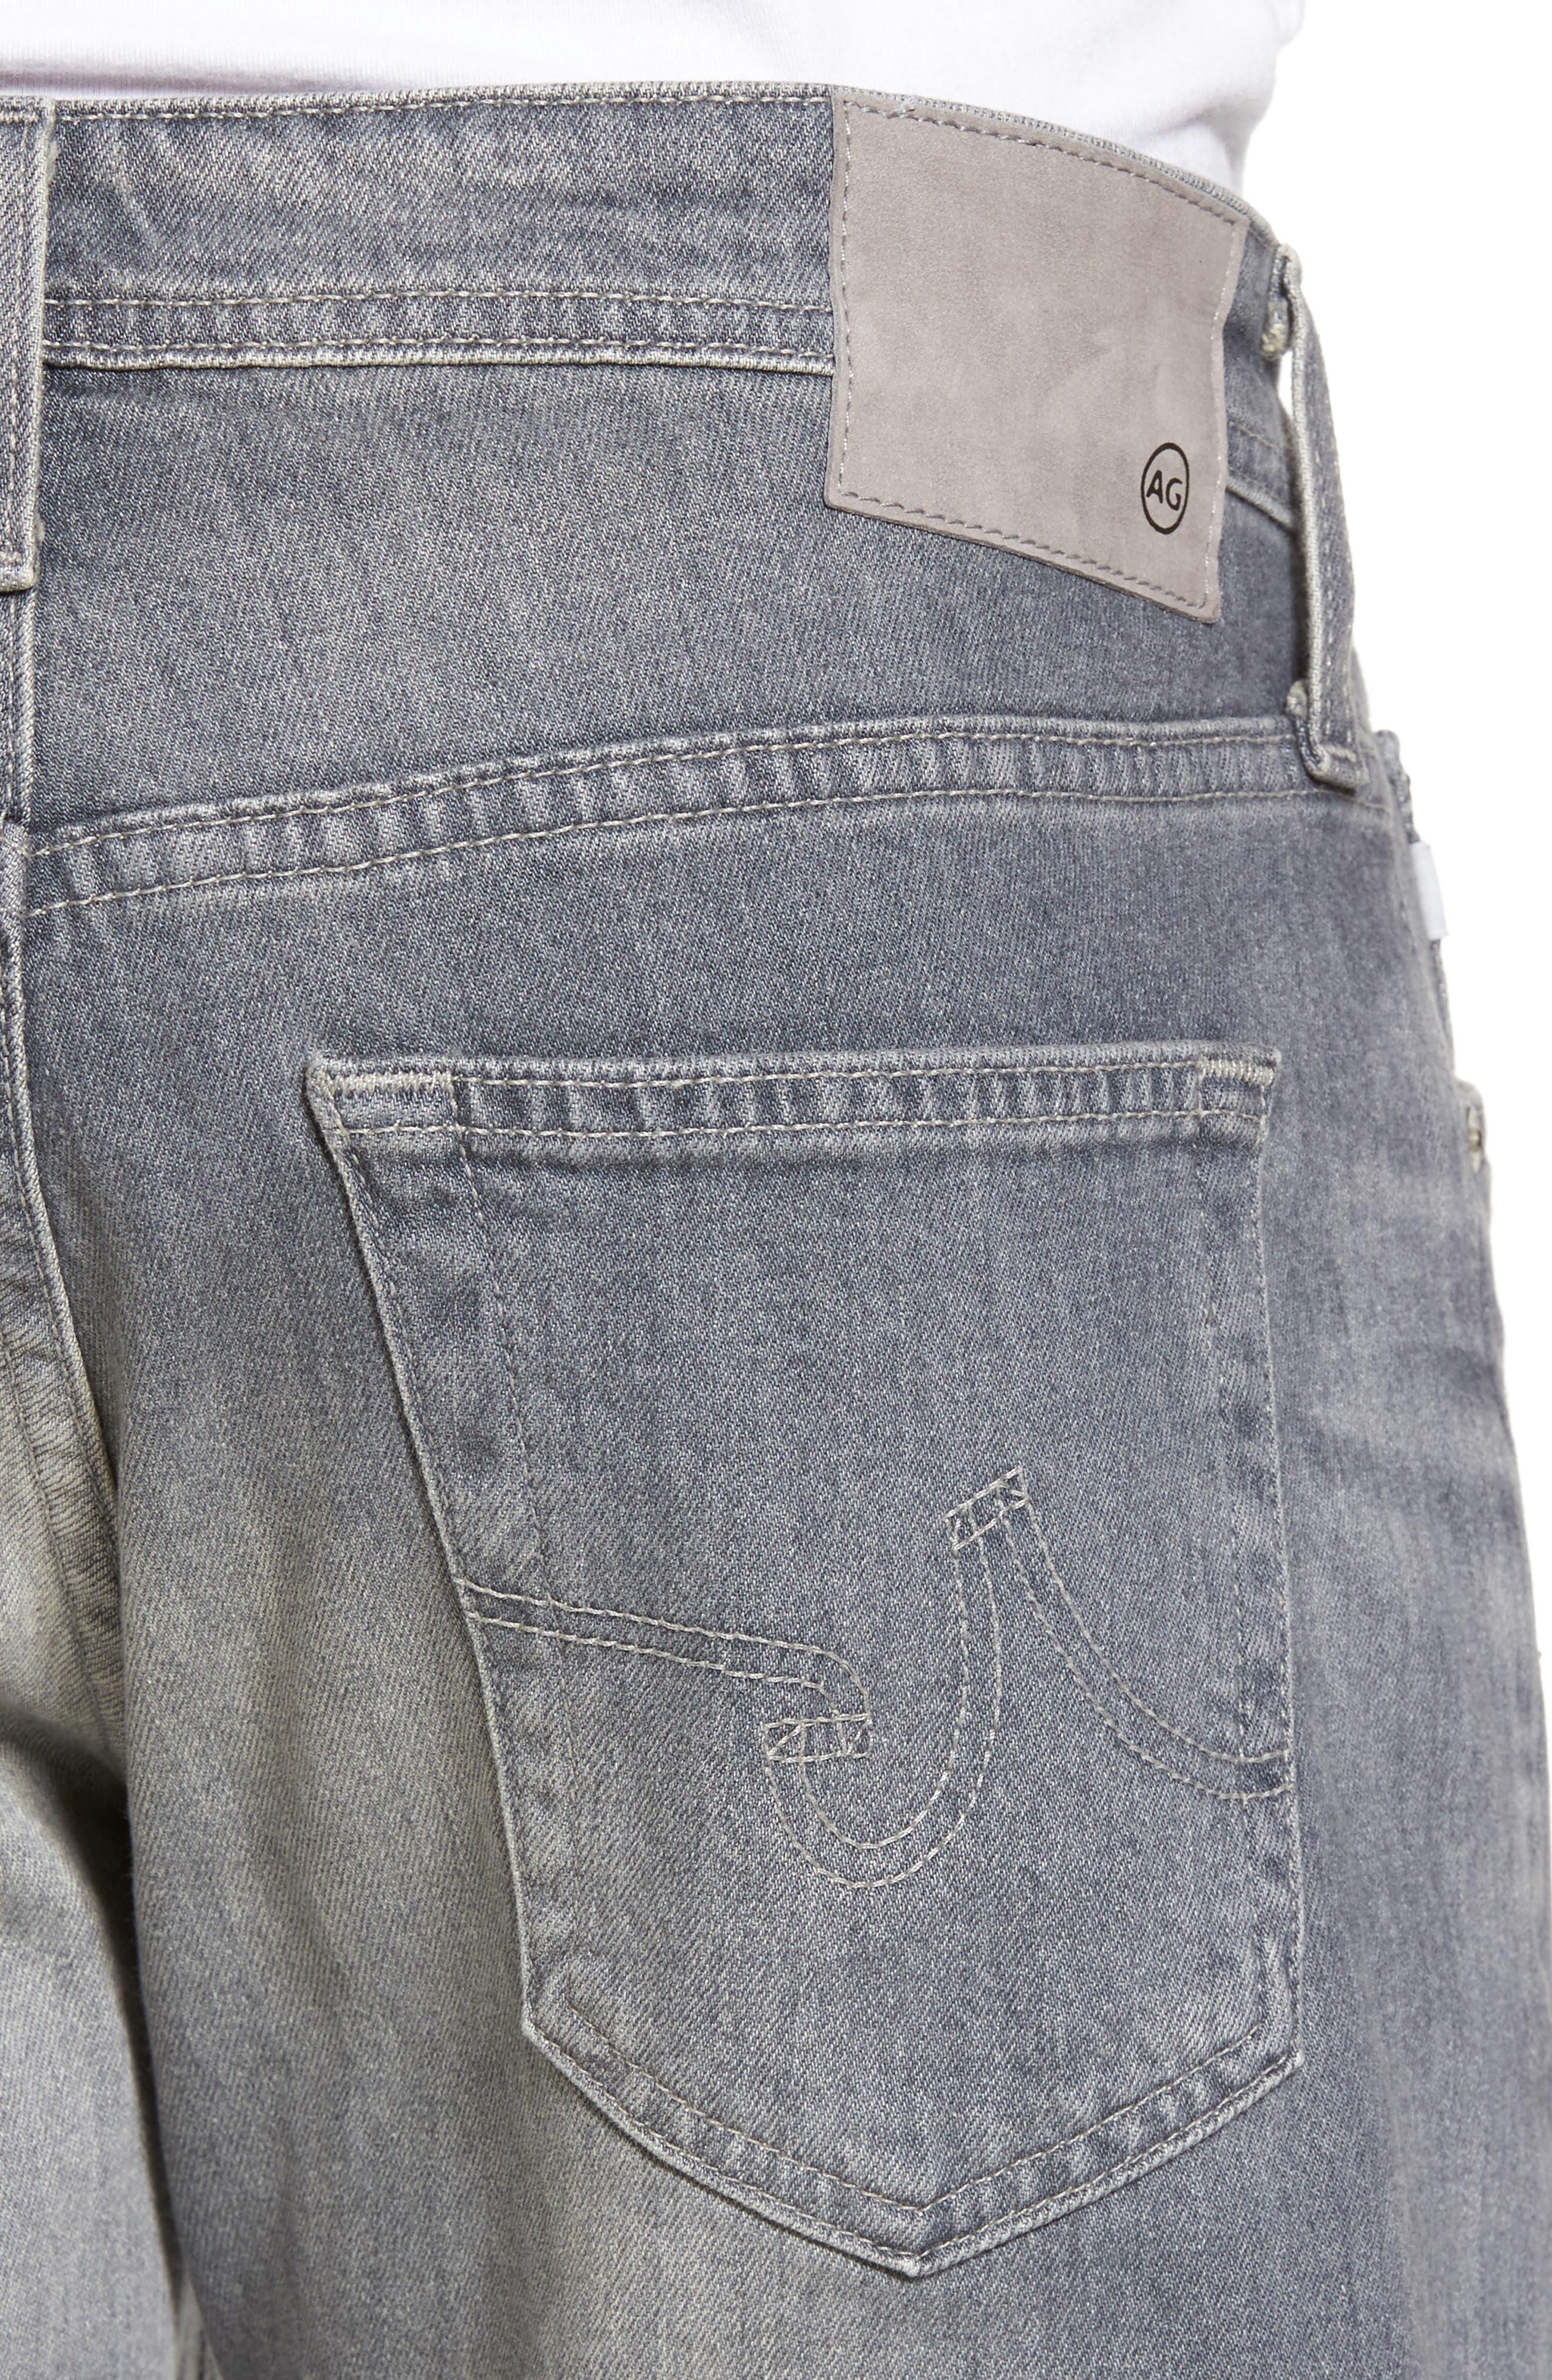 Graduate Slim Straight Fit Jeans,                             Alternate thumbnail 4, color,                             020